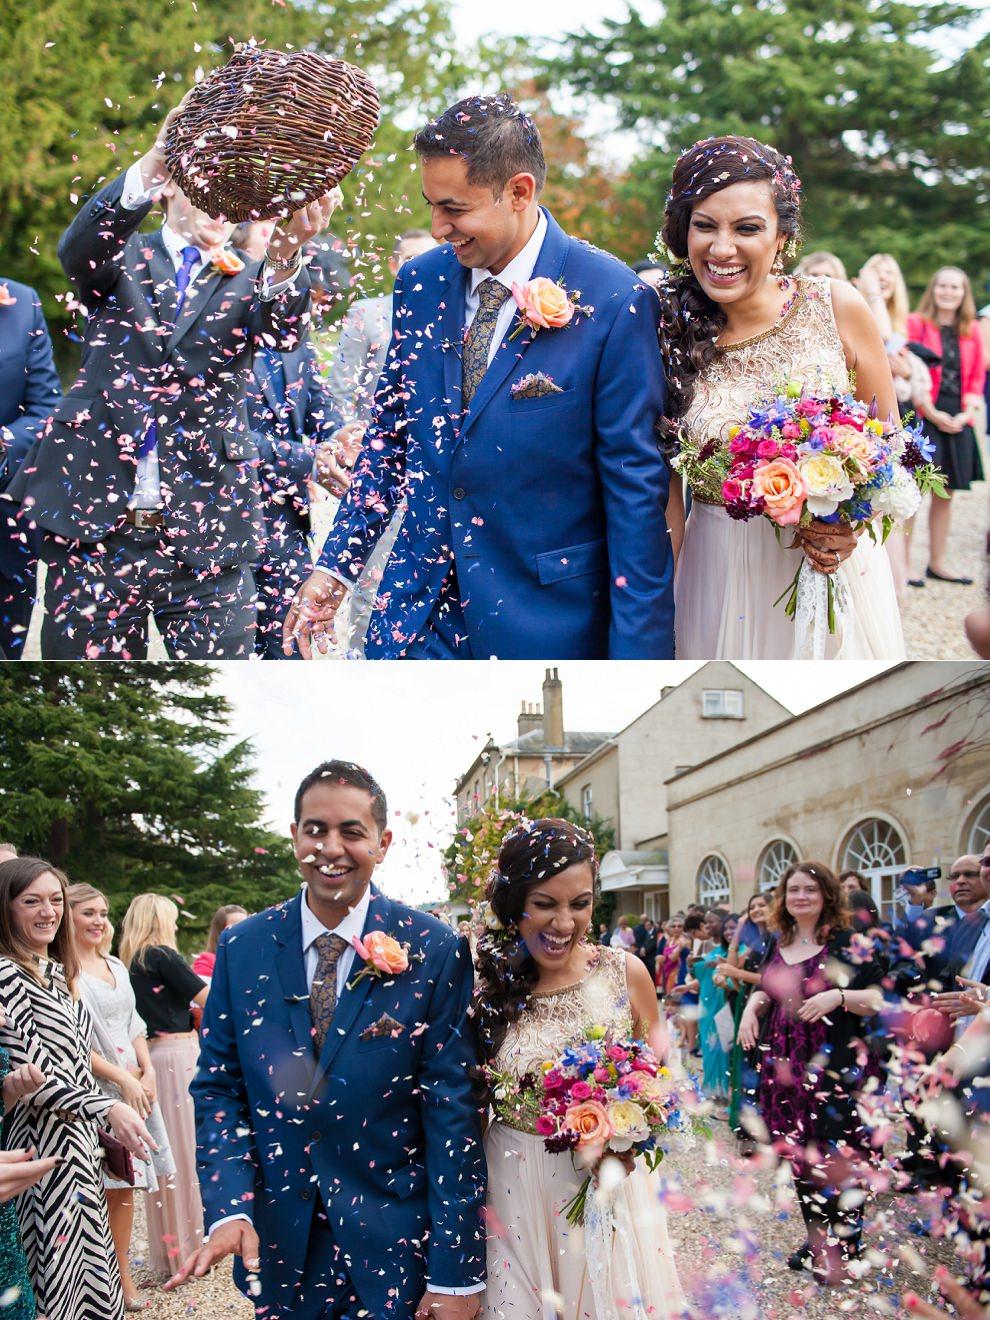 Best-wedding-photos-UK-2015-084